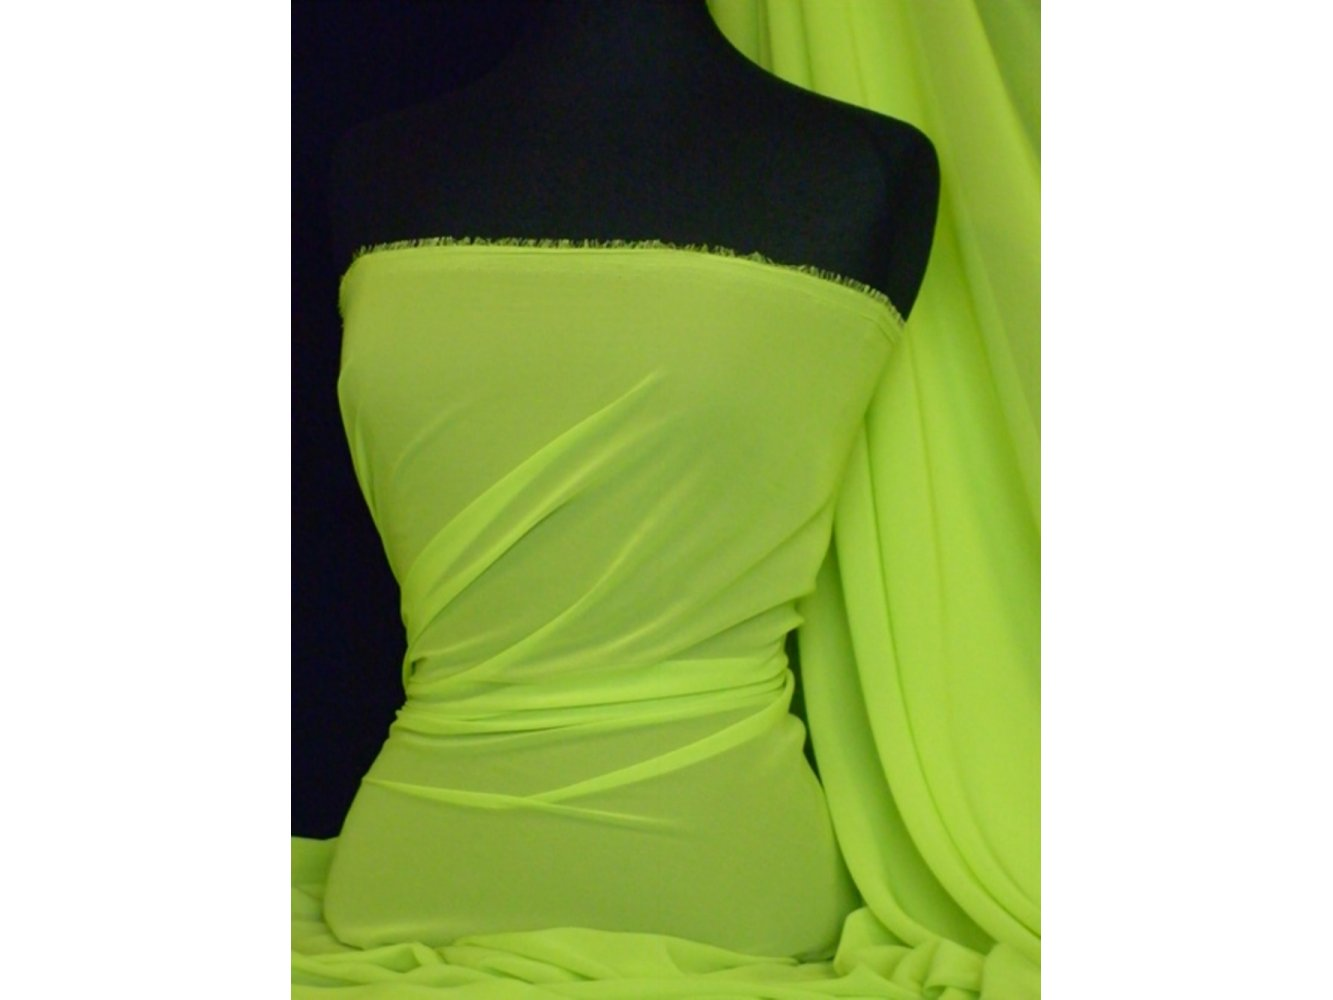 Chiffon Soft Touch Sheer Fabric Material  Lime Green Q354 LMGRN. U2039